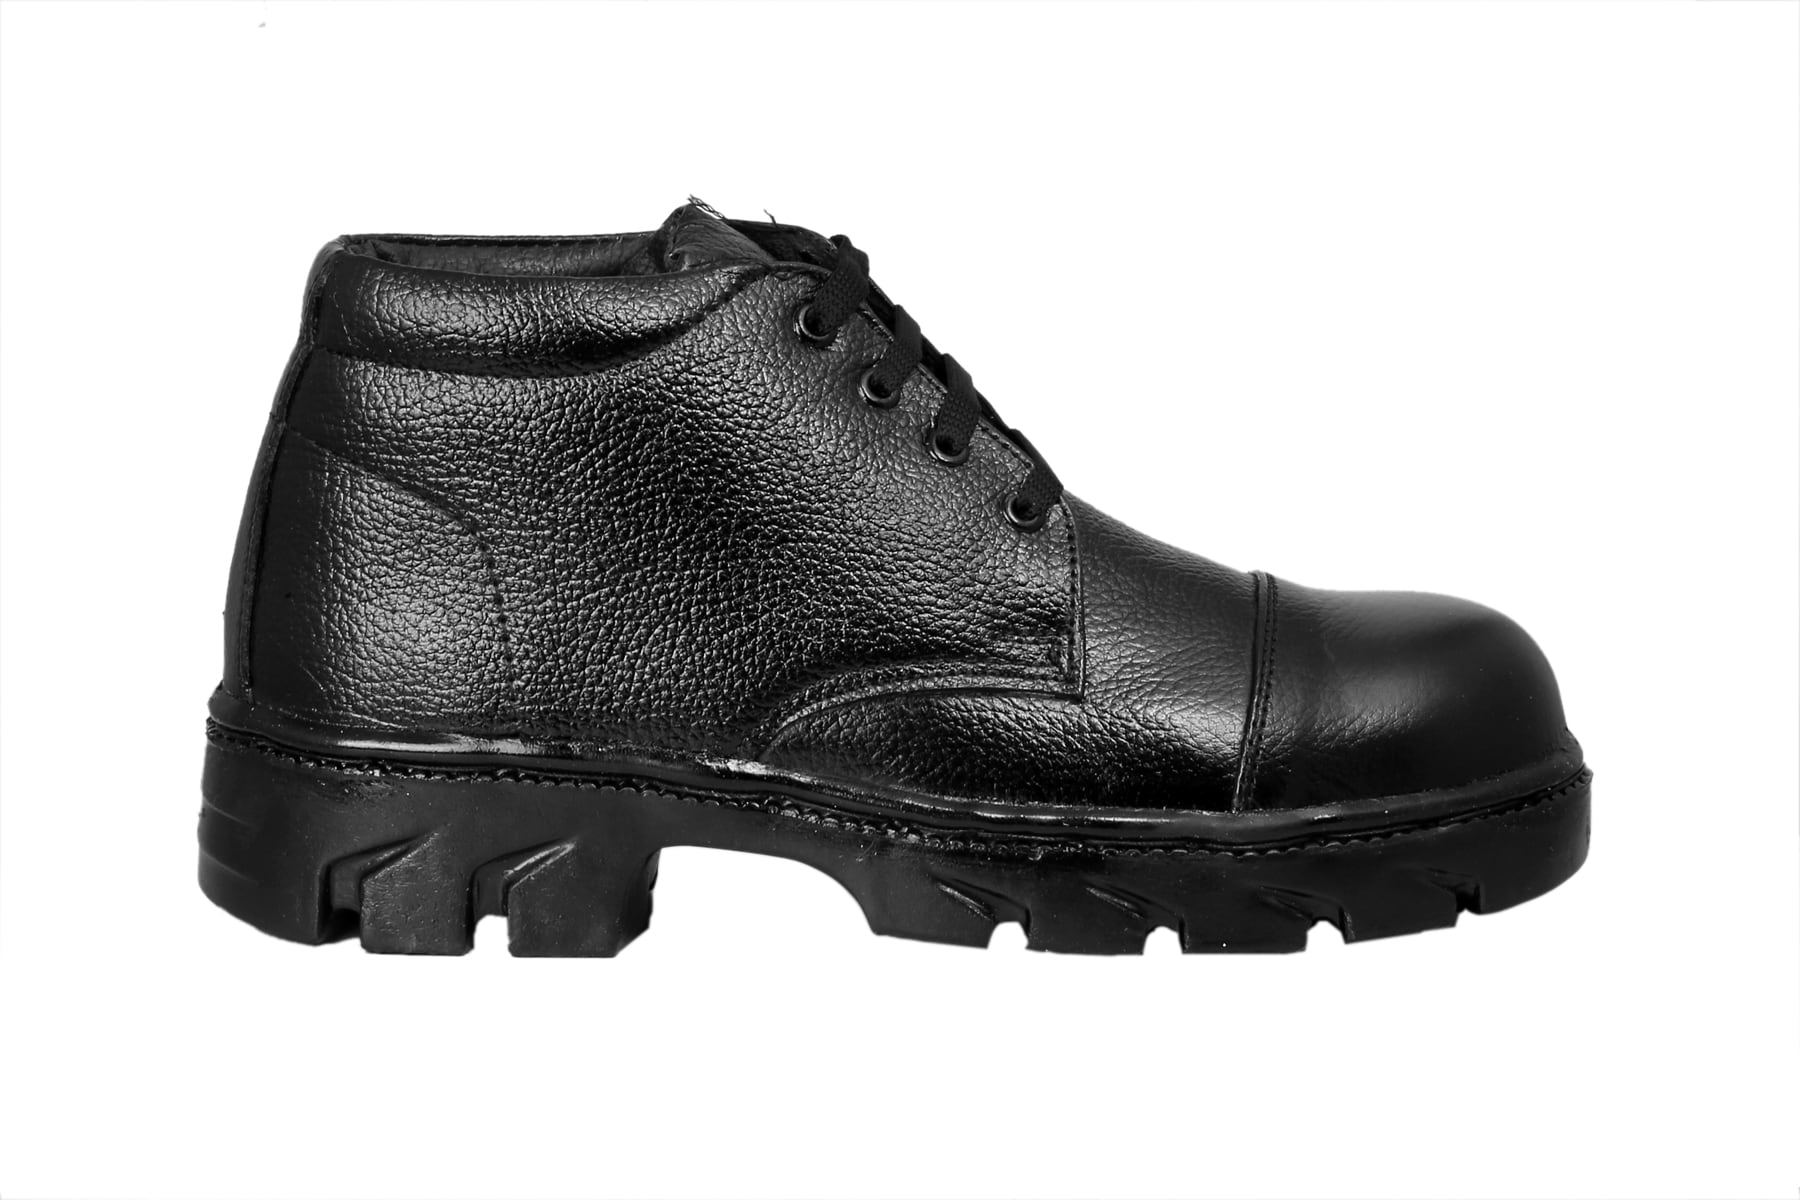 JK STEEL DURABLE PVC CHEAPEST BUDGET BLACK SAFETY SHOES JKPB008BLK (BLACK,6-10,1 PAIR)